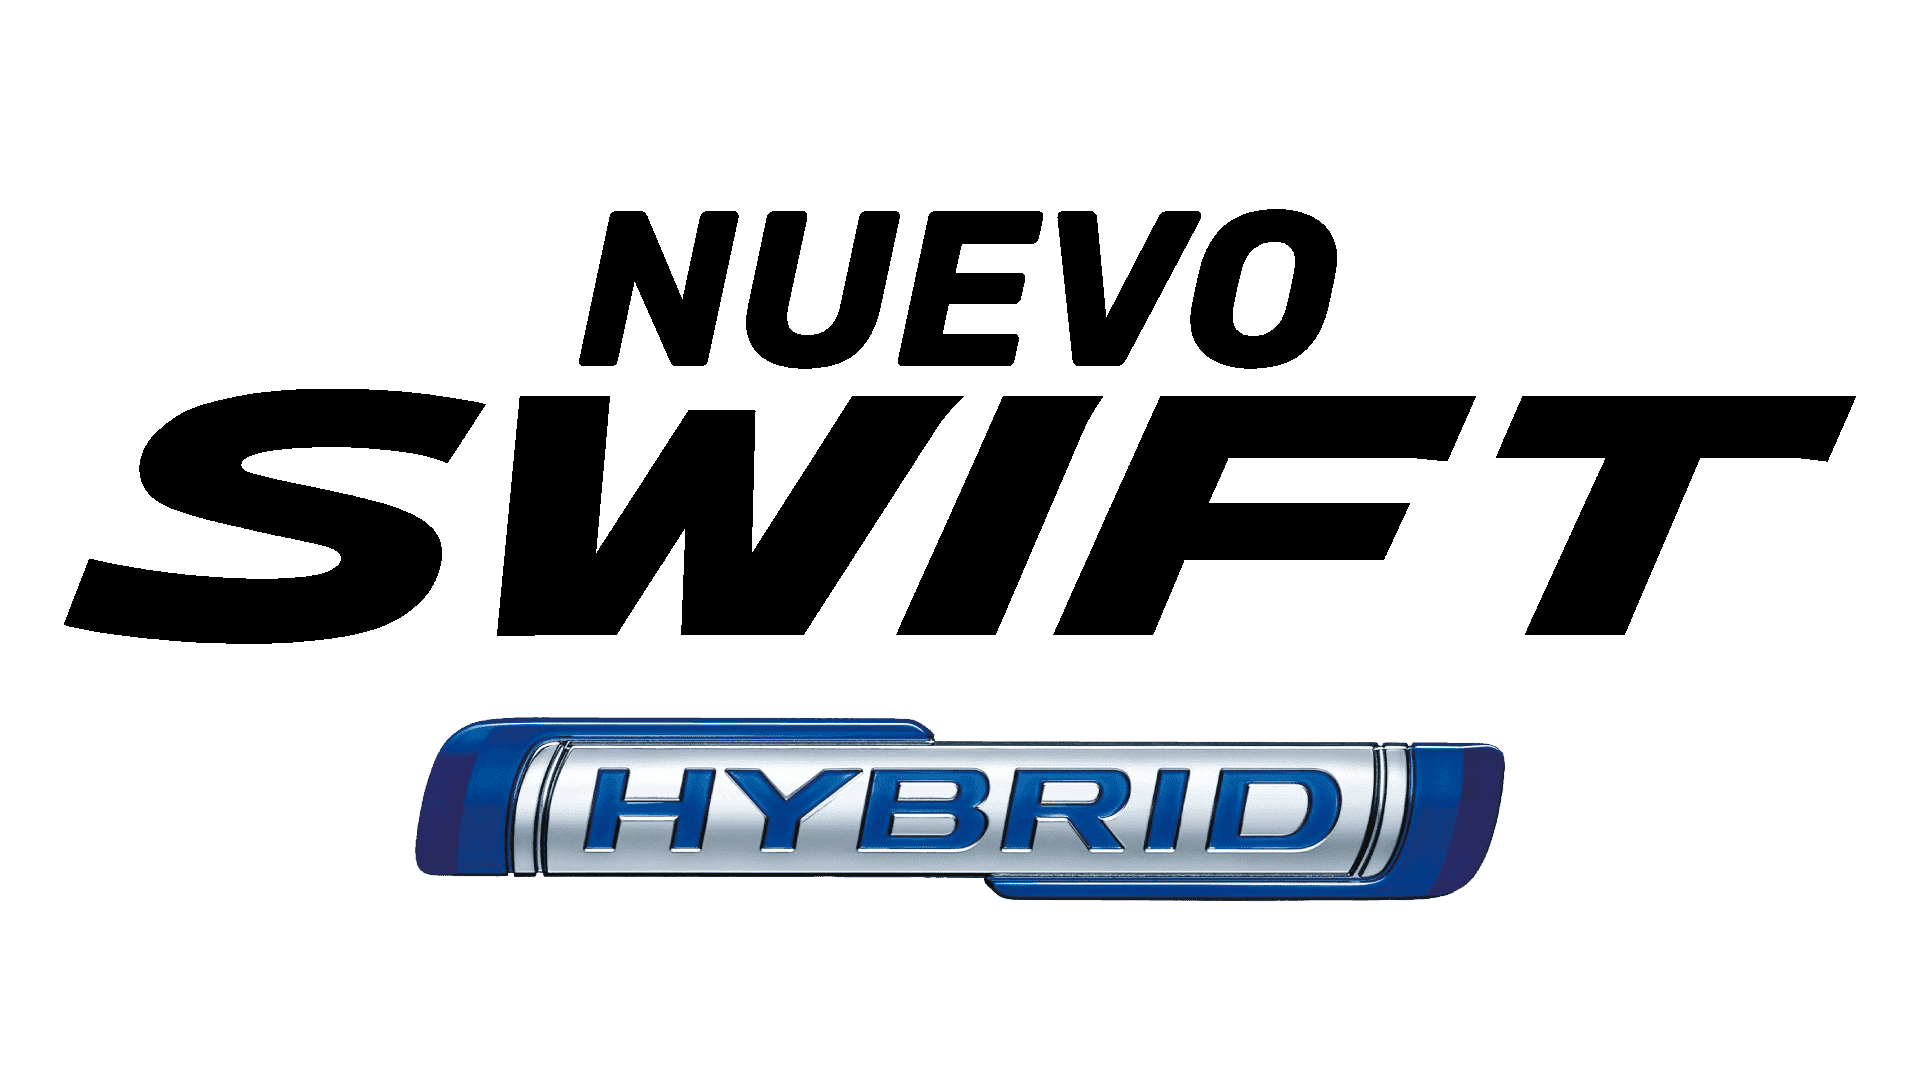 Nuevo Swift Hybrid